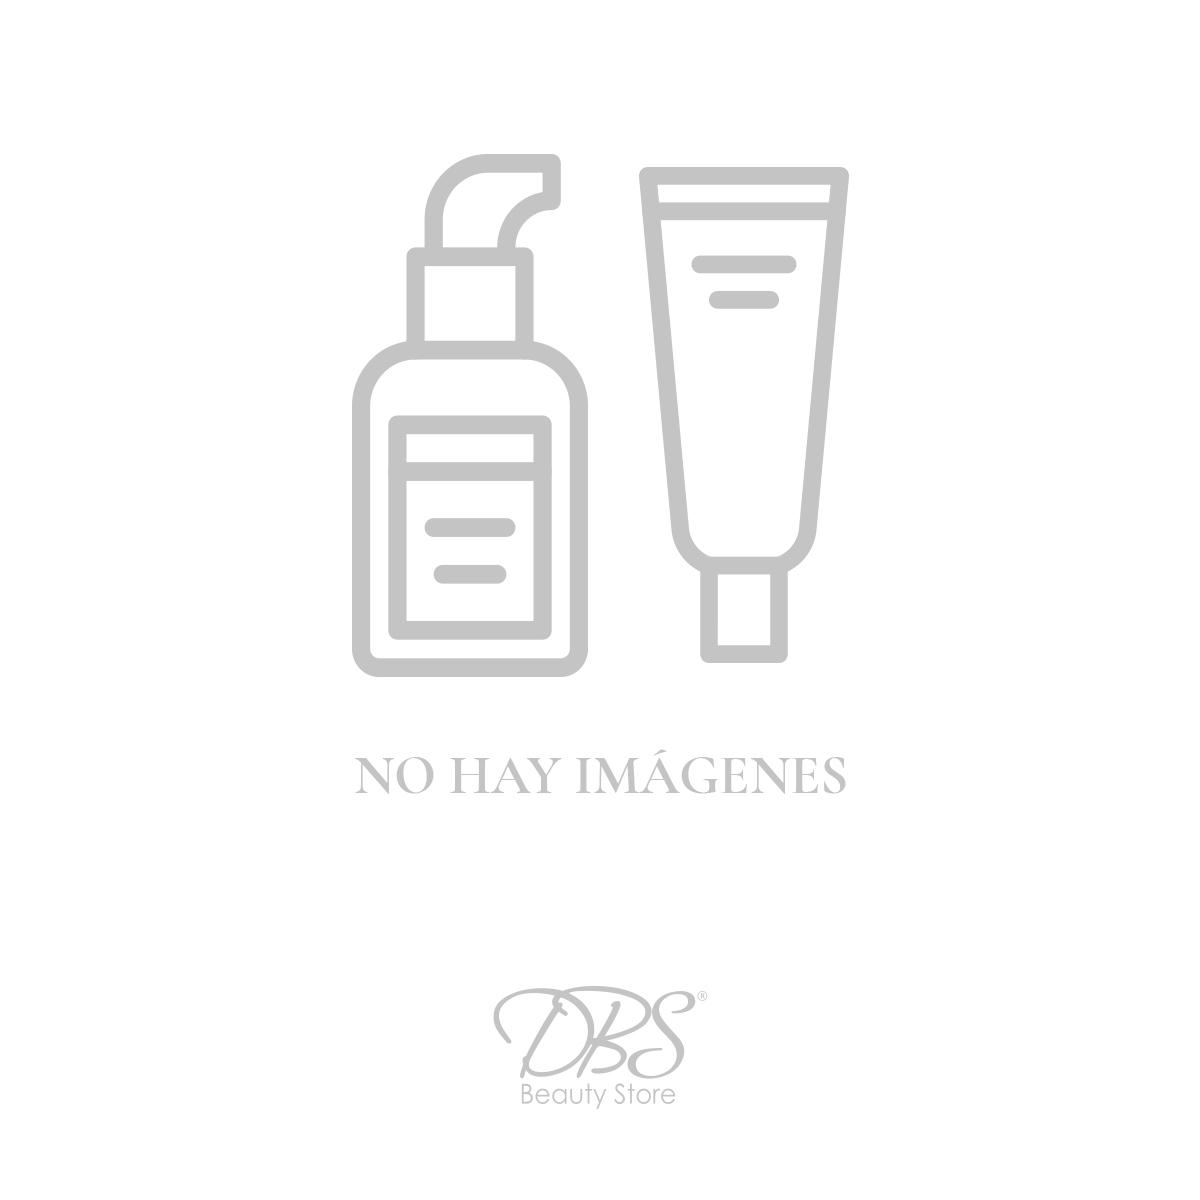 Beauty Box Nudes Y Pastels